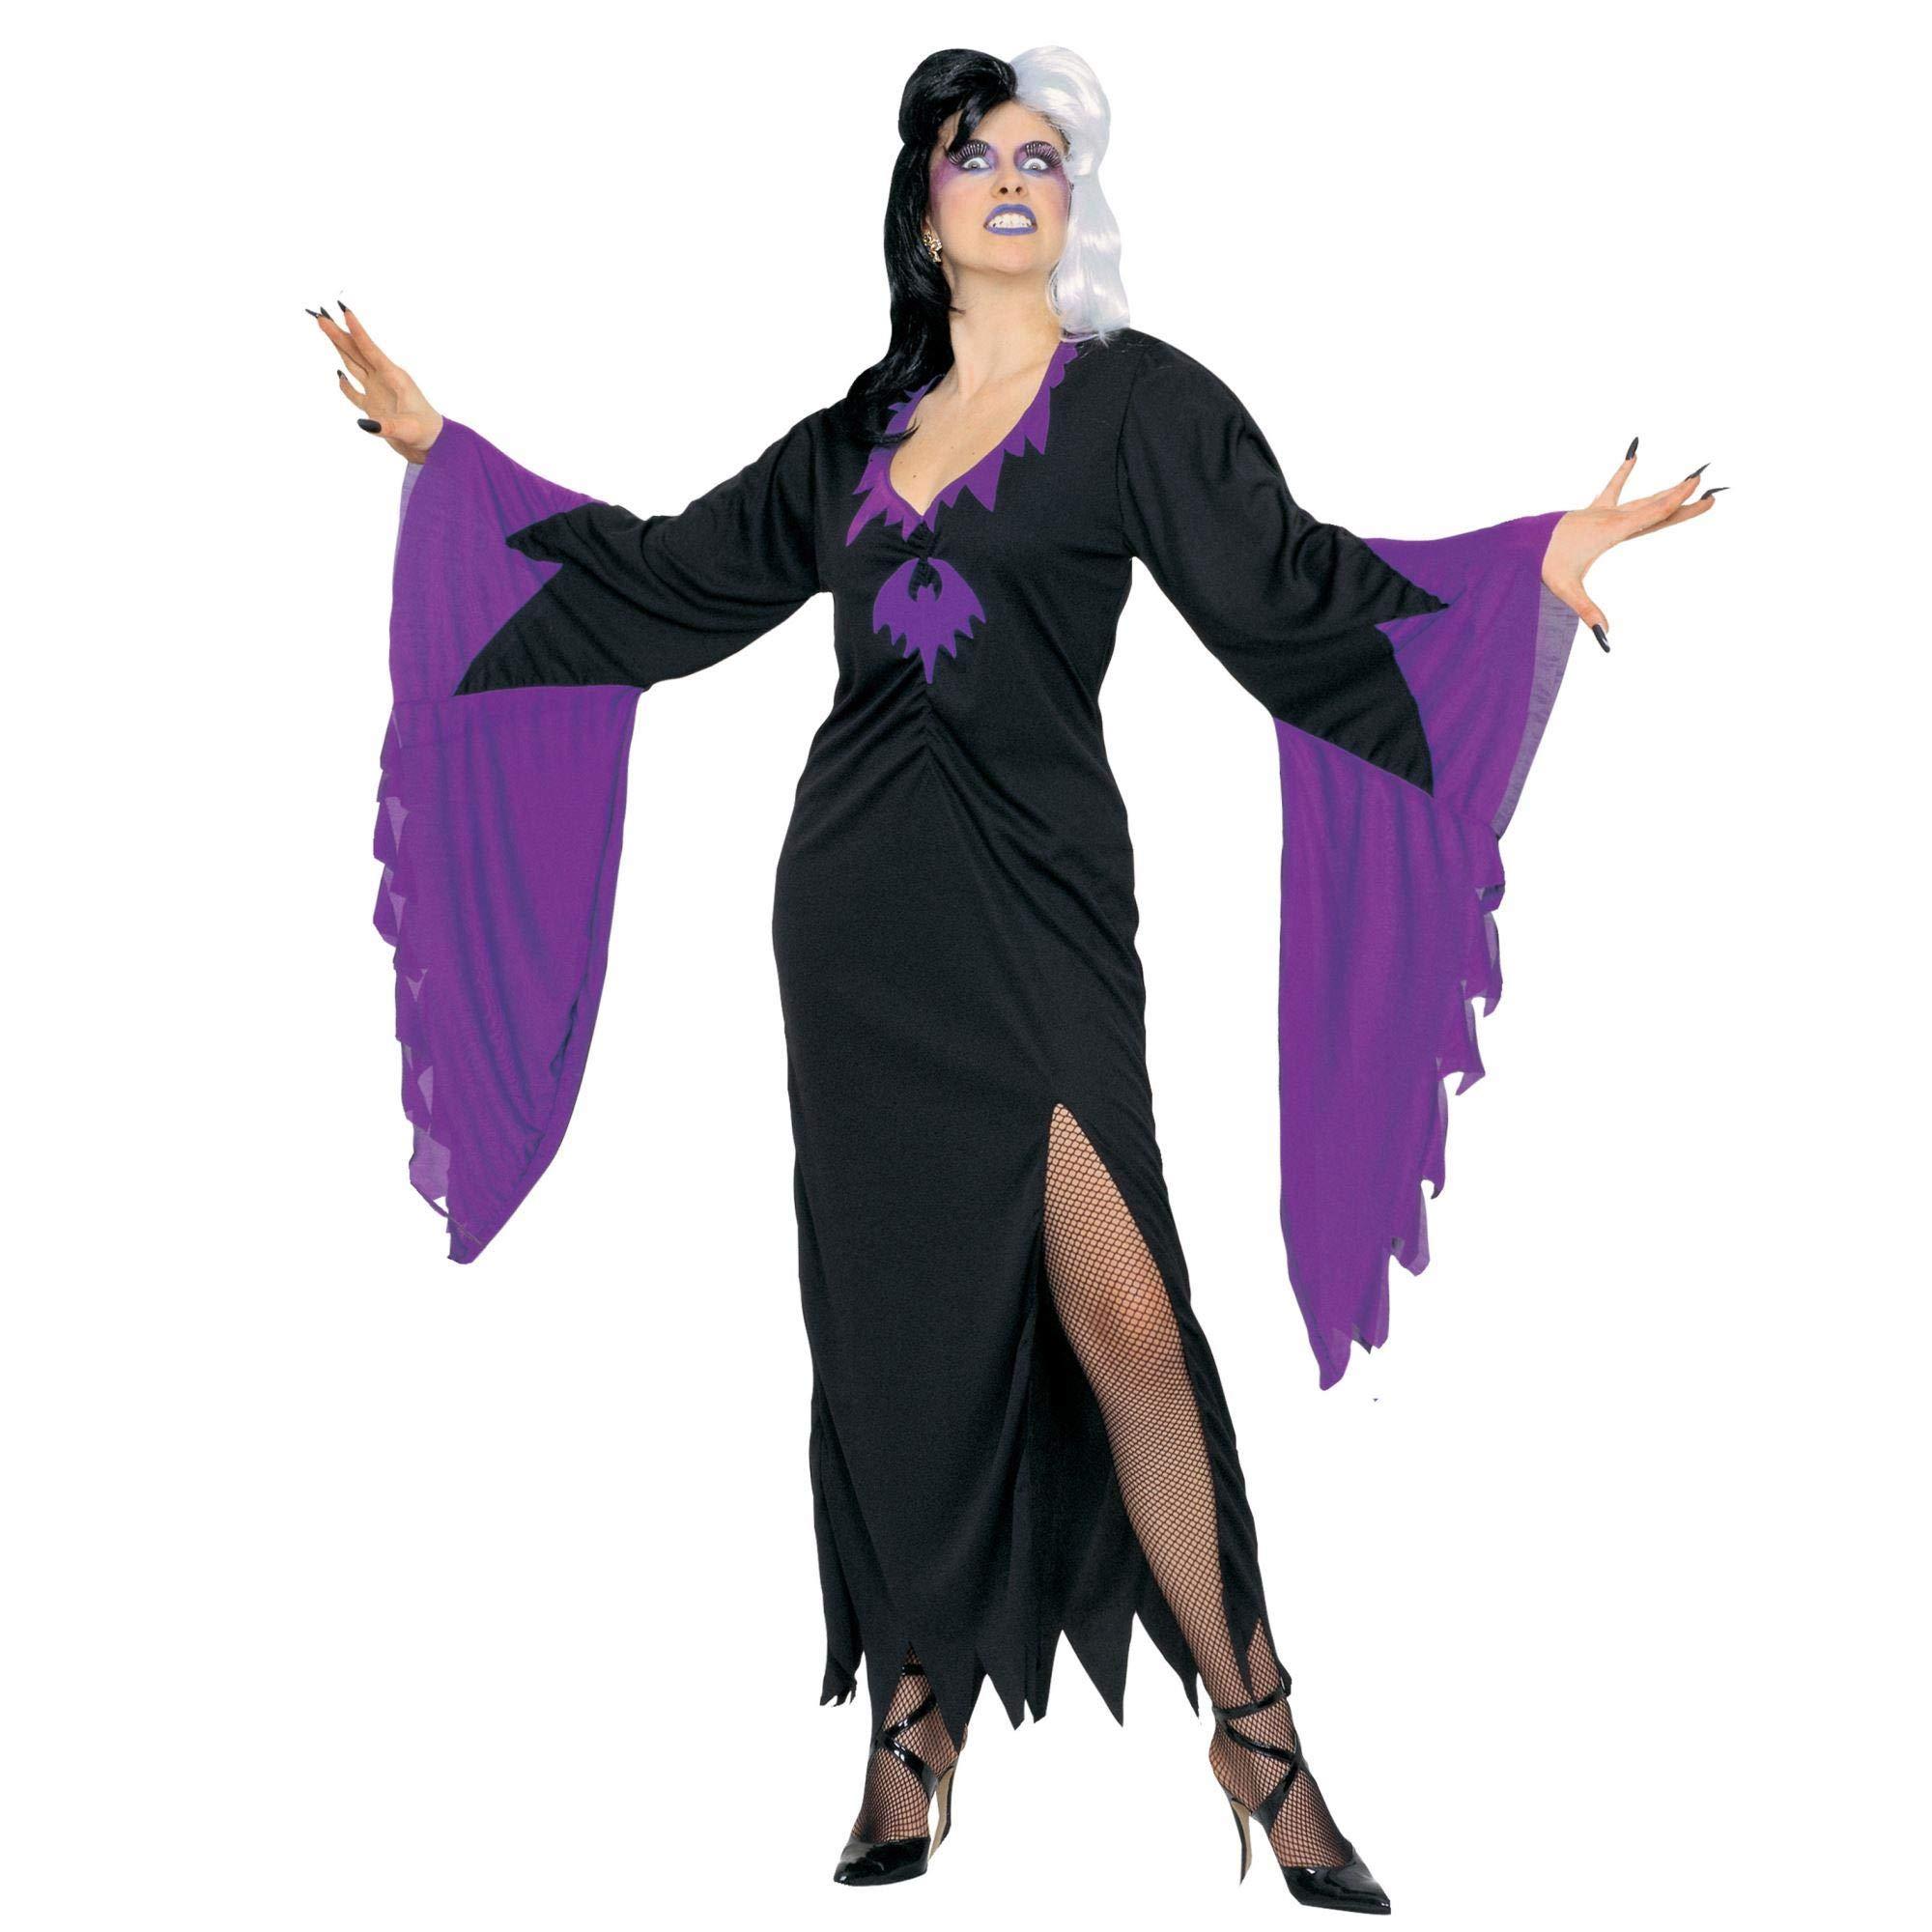 Sancto Disfraz de Halloween adultos, talla UK 14-16 (S/39423 ...